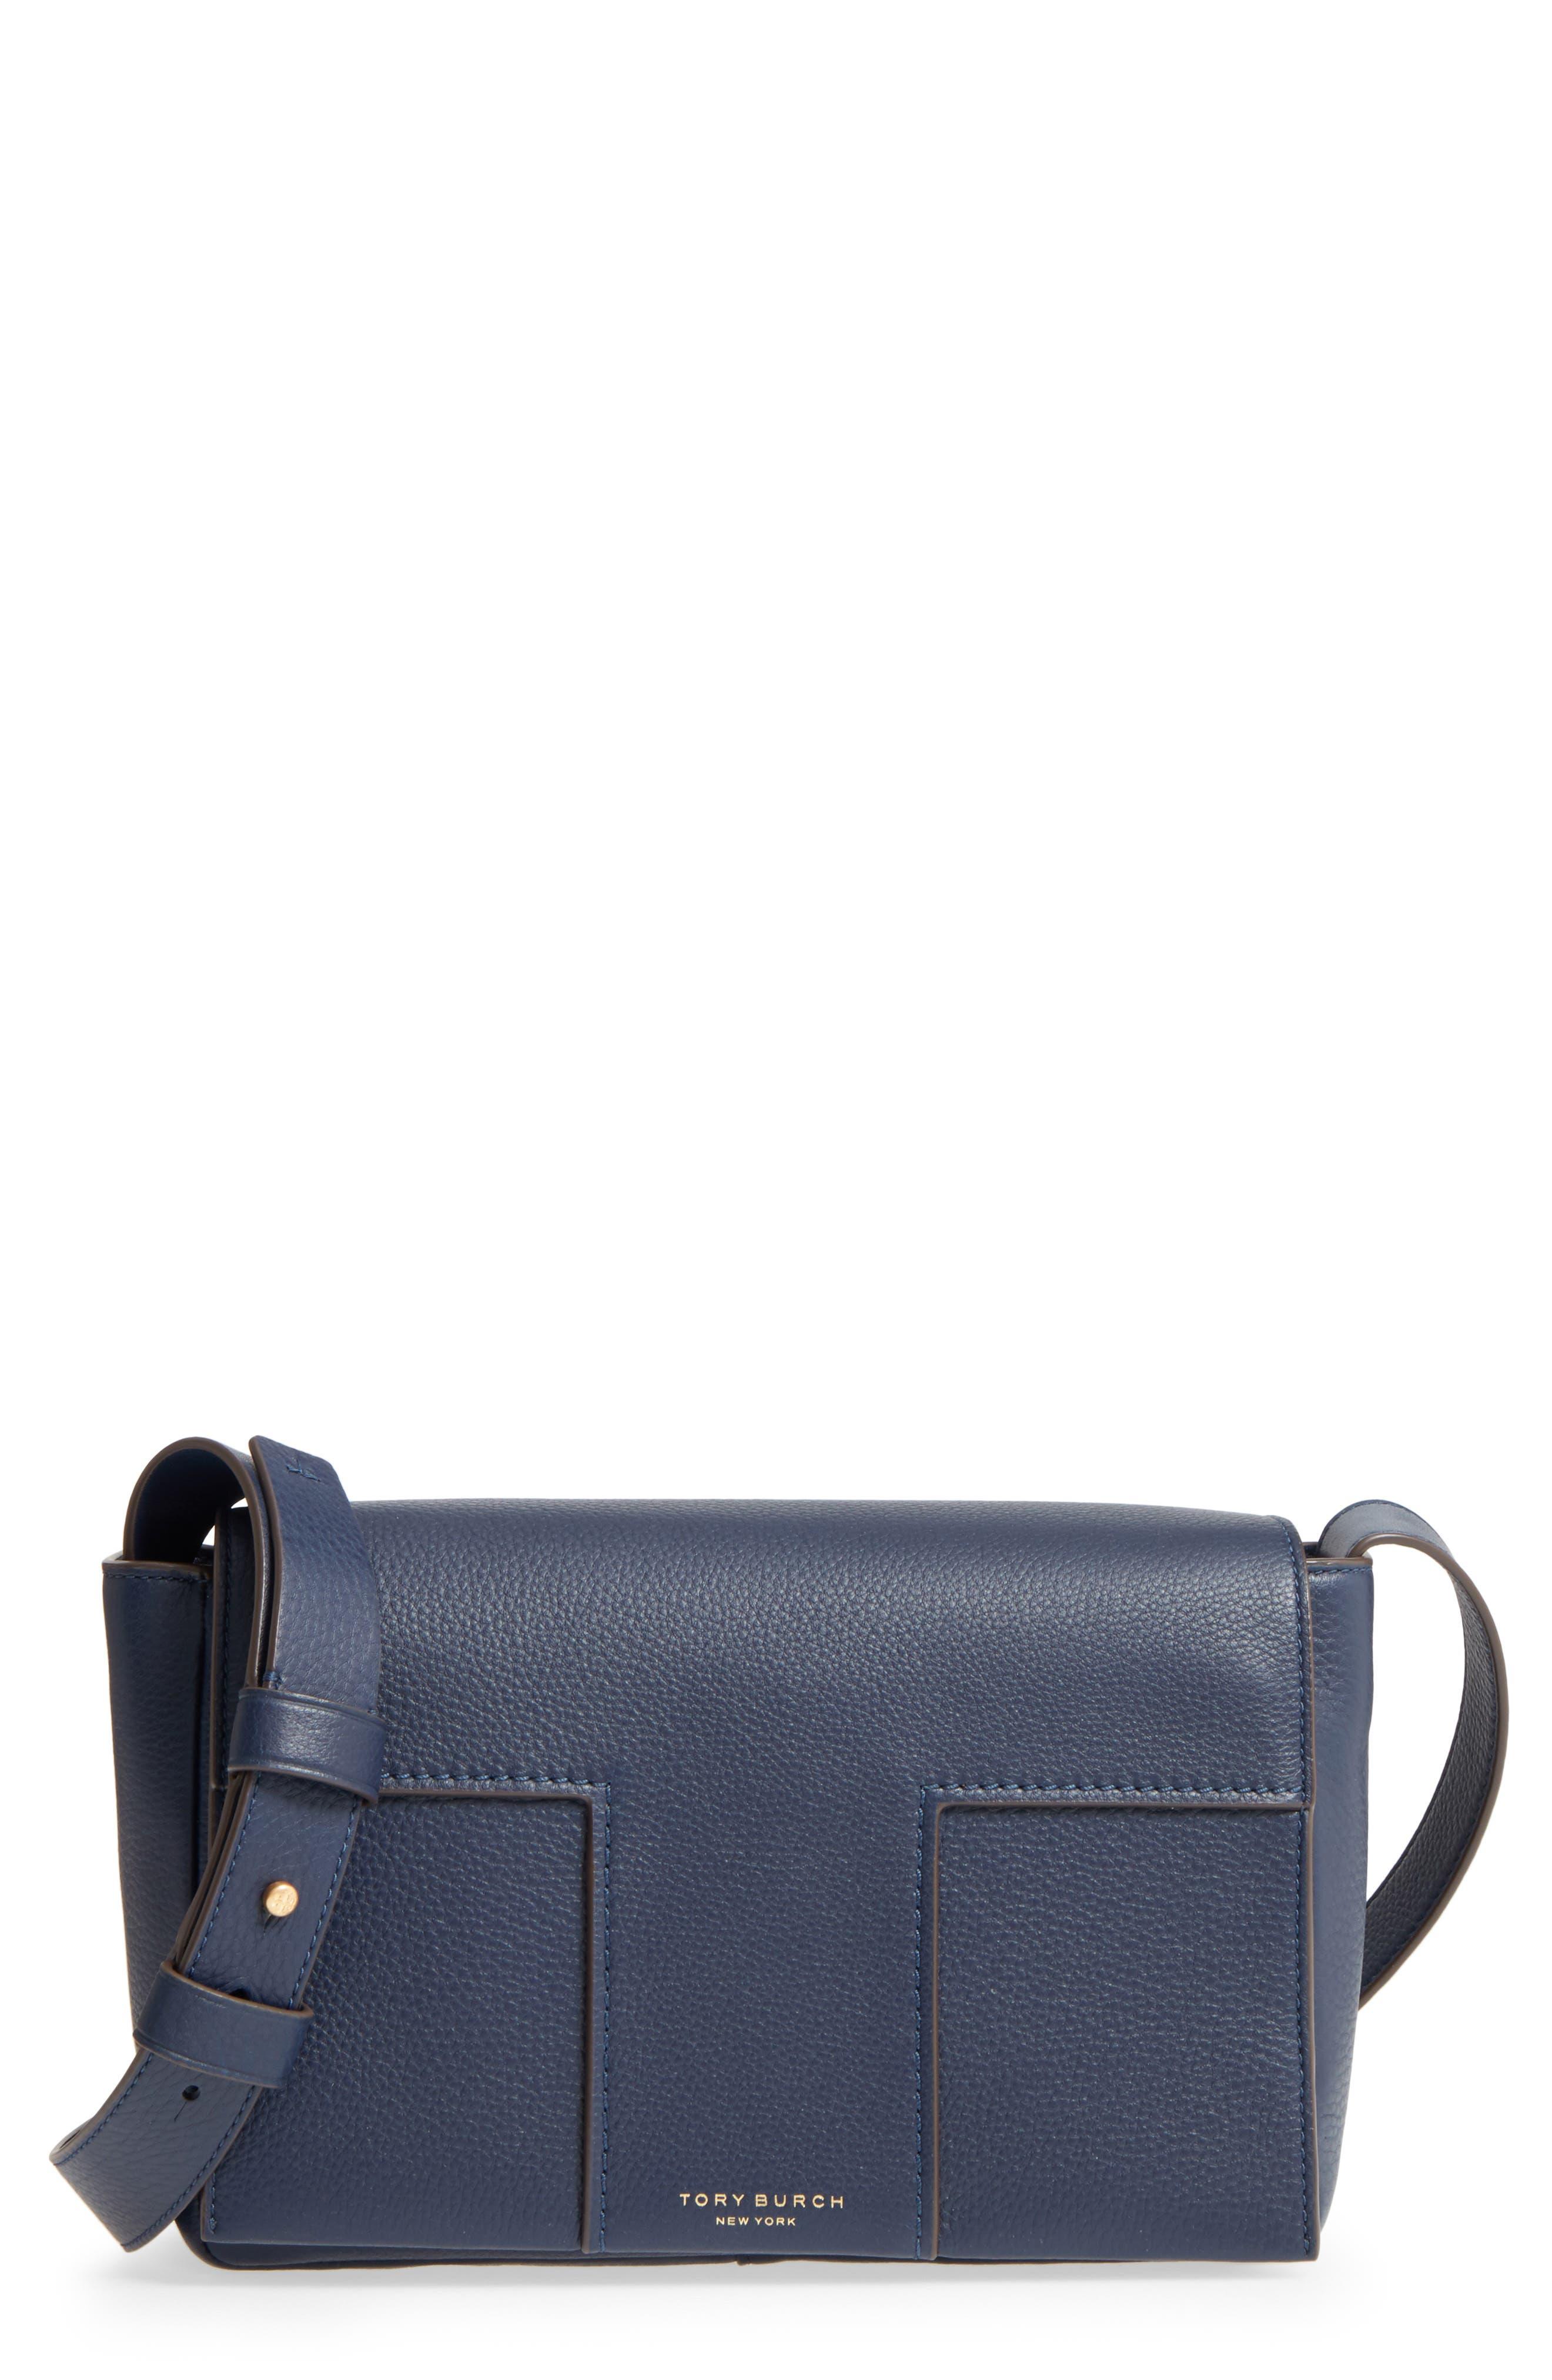 Tory Burch Handbags & Wallets | Nordstrom